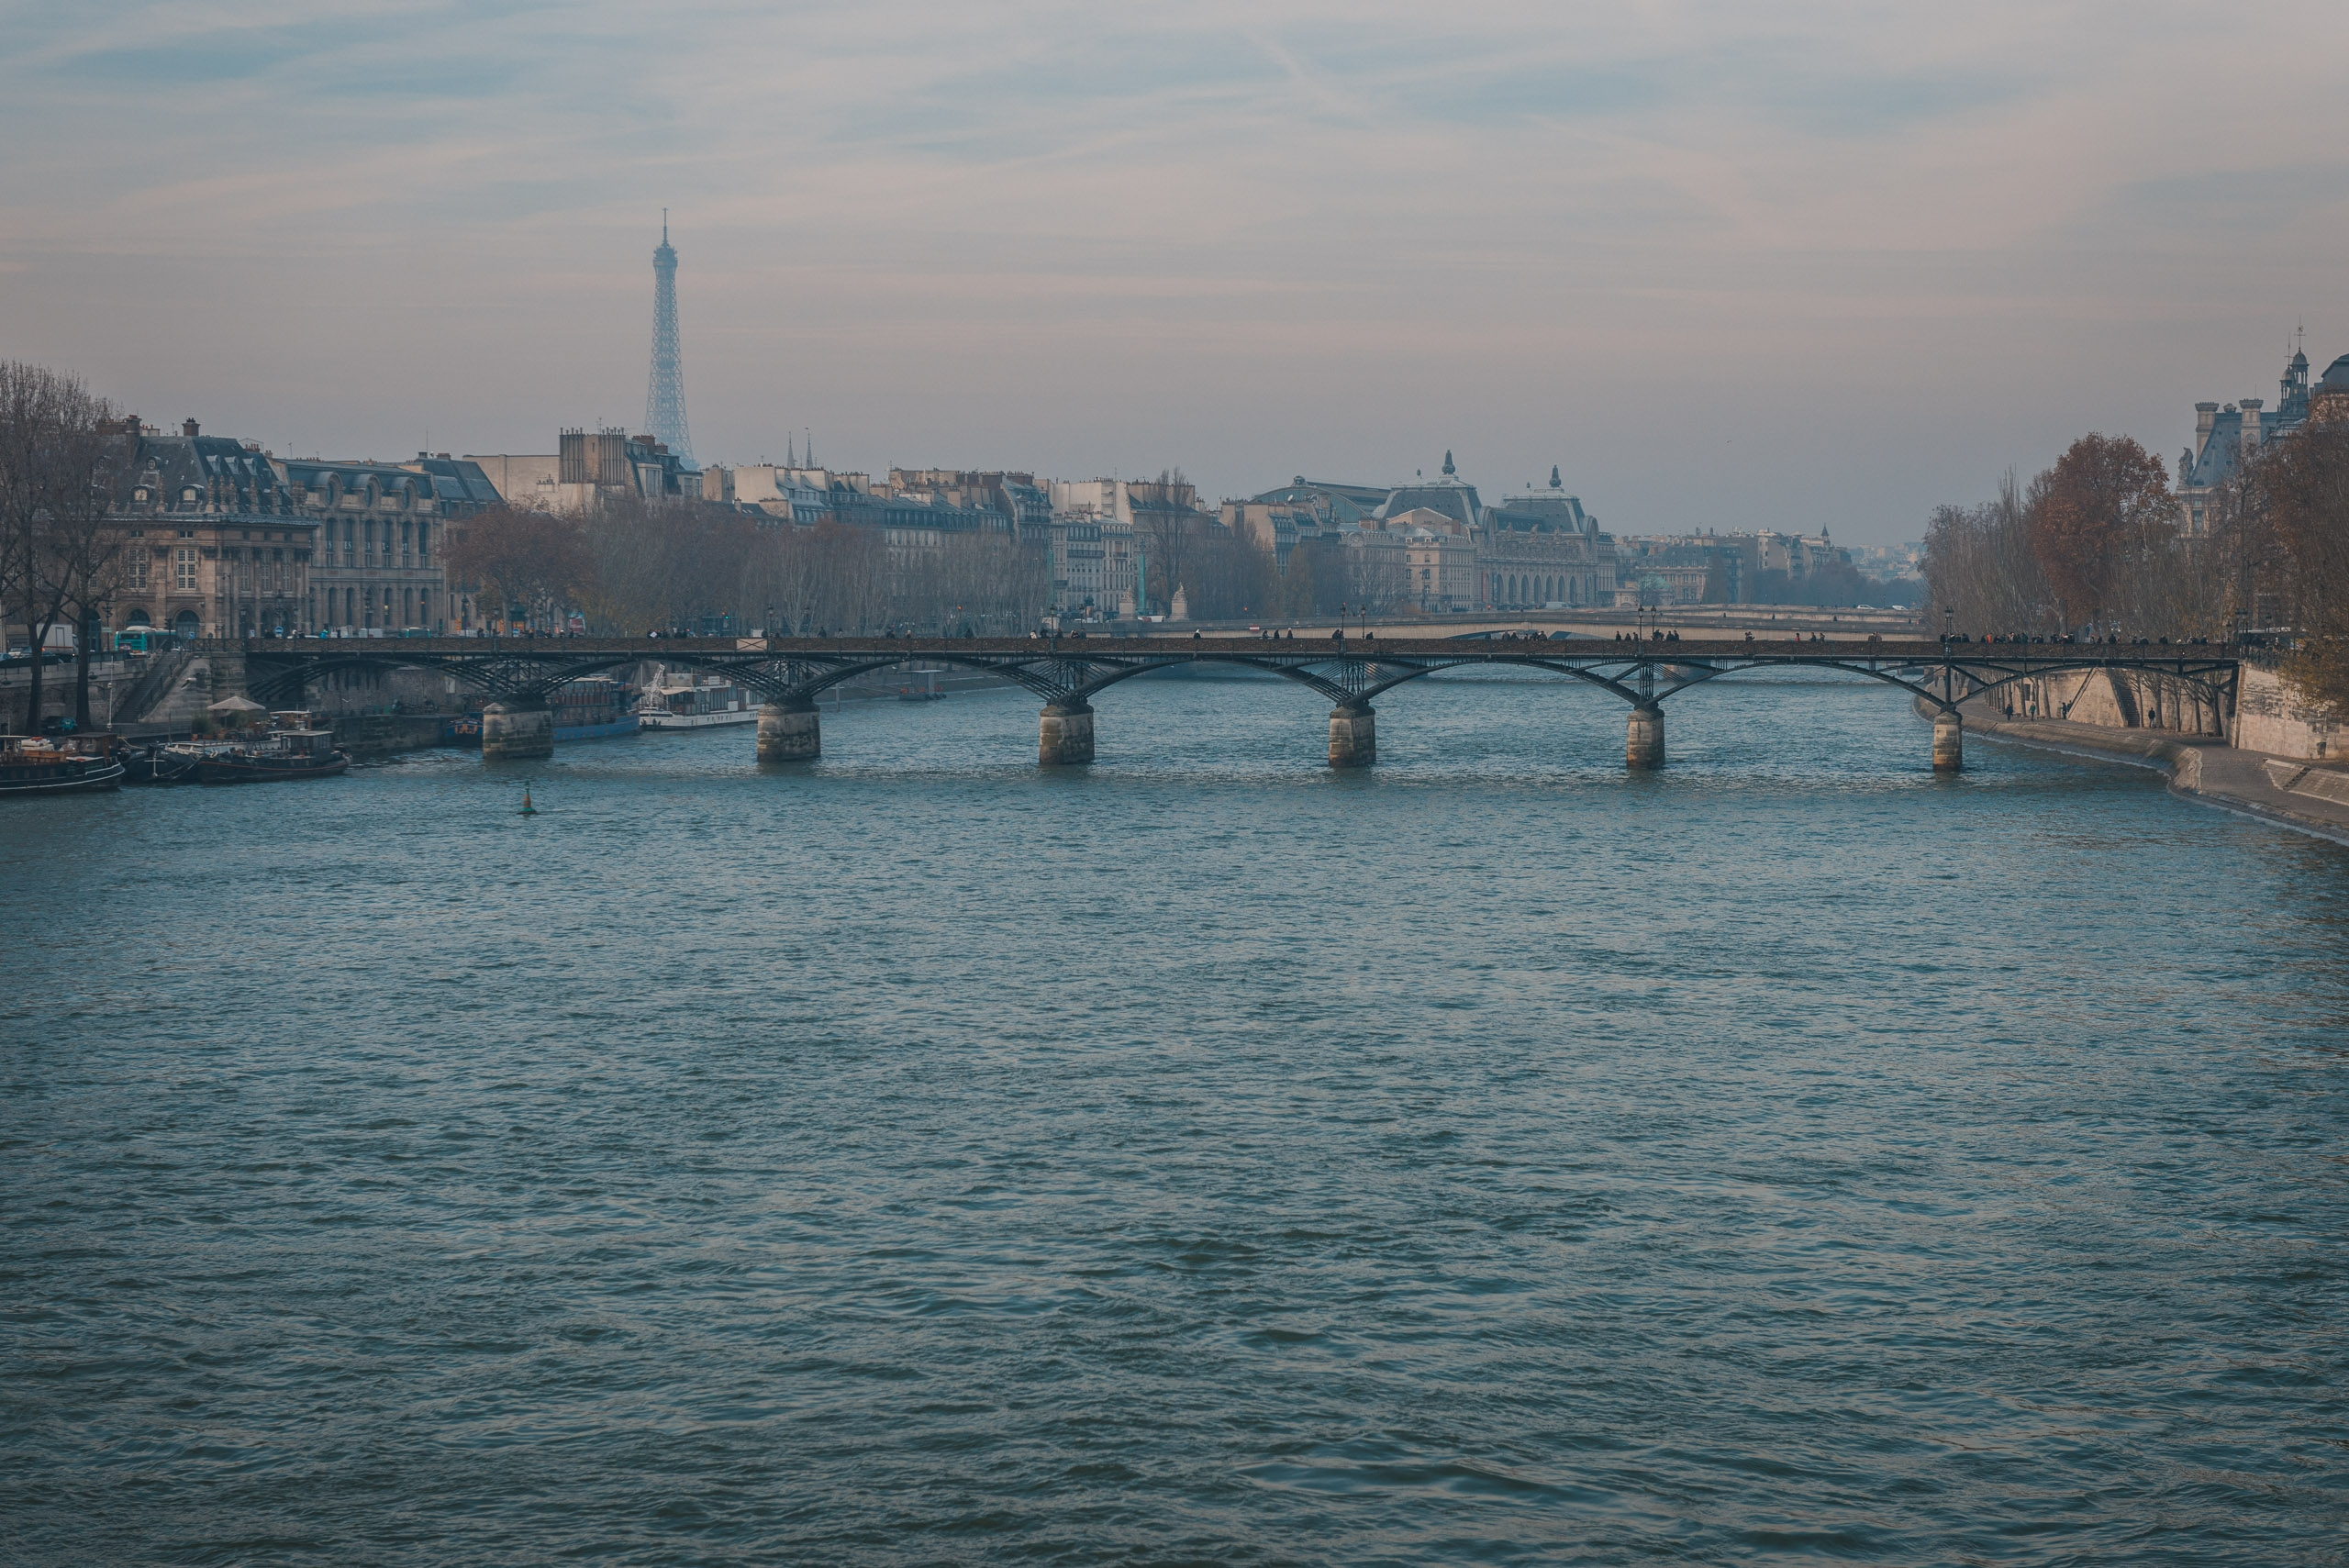 Overlooking the Seine